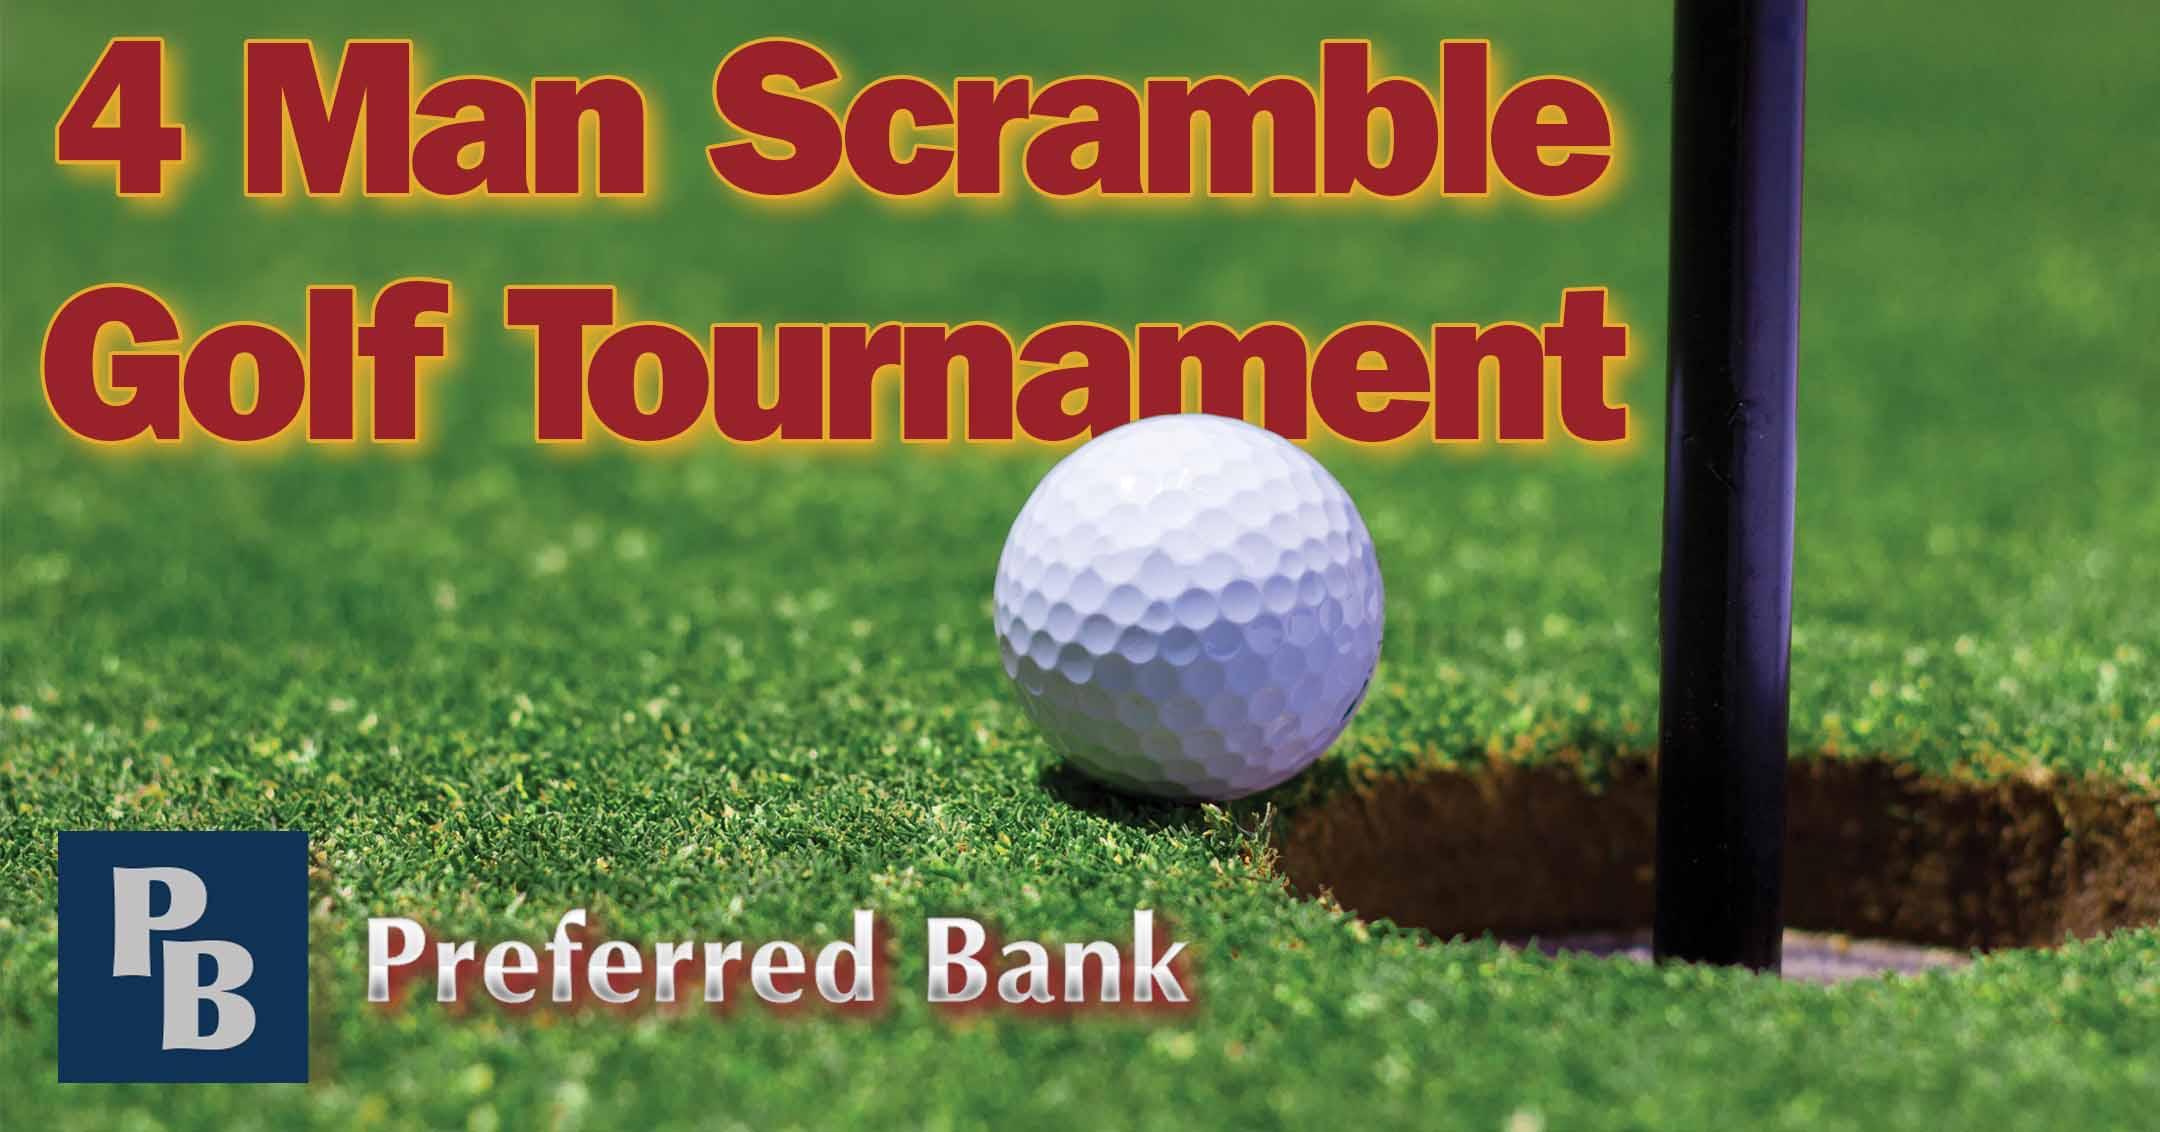 2021 4 Man Scramble Golf Tournament | DowntownMarceline.org